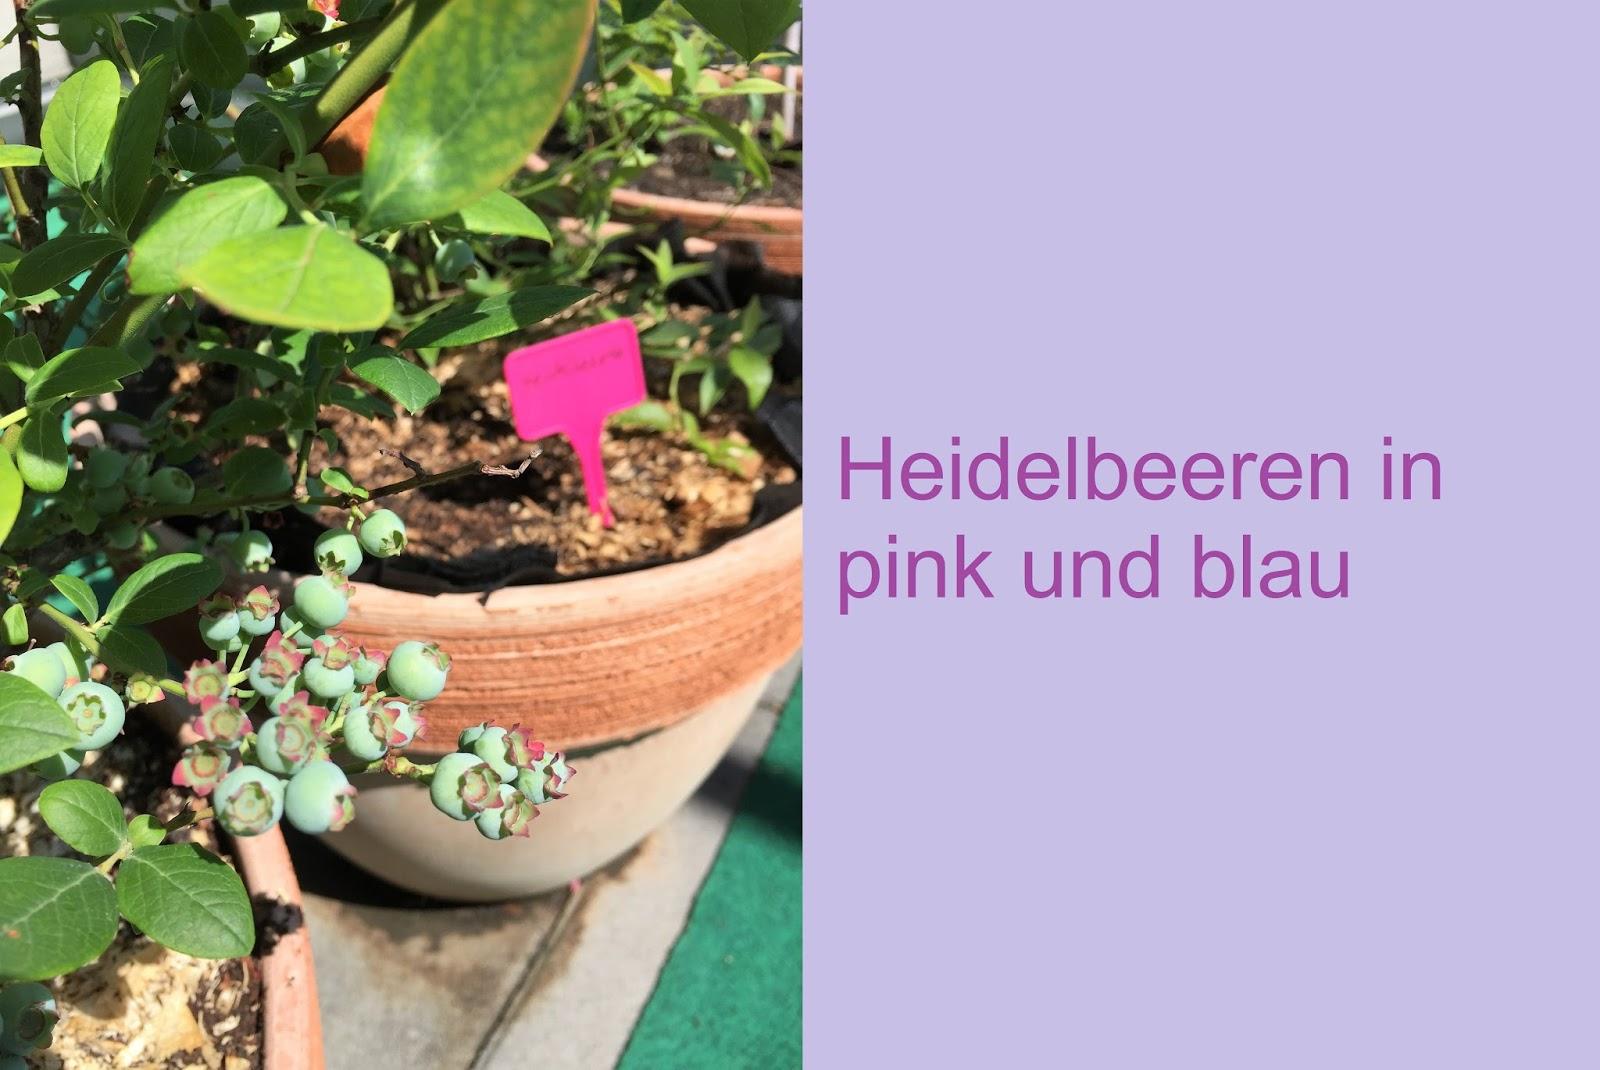 edgarten beerentr ume in pink und blau. Black Bedroom Furniture Sets. Home Design Ideas